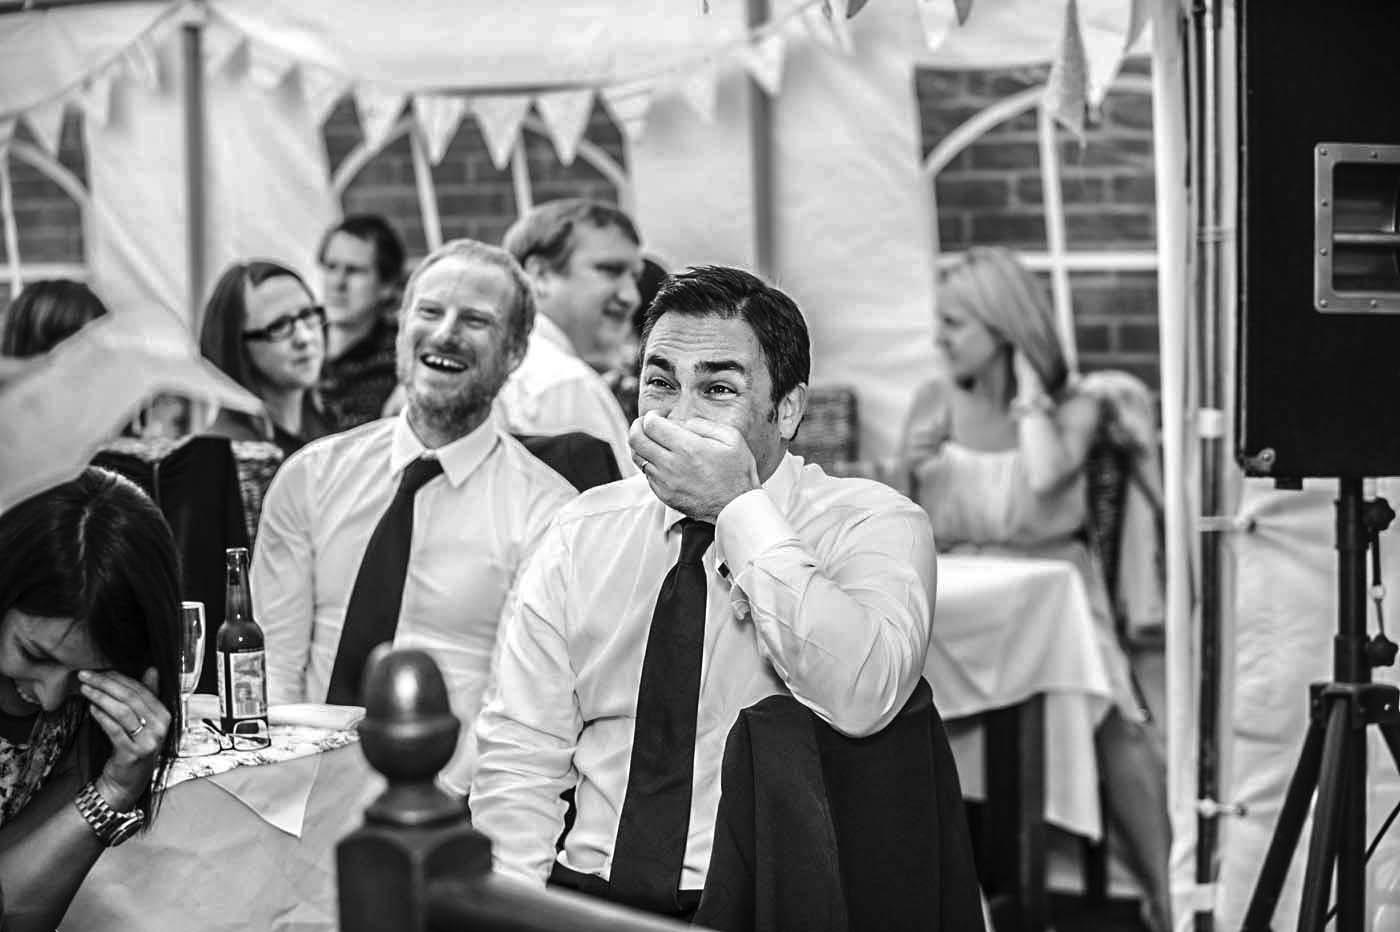 WEDDING-GUEST-DURING-SPEECHES-READING.jpg